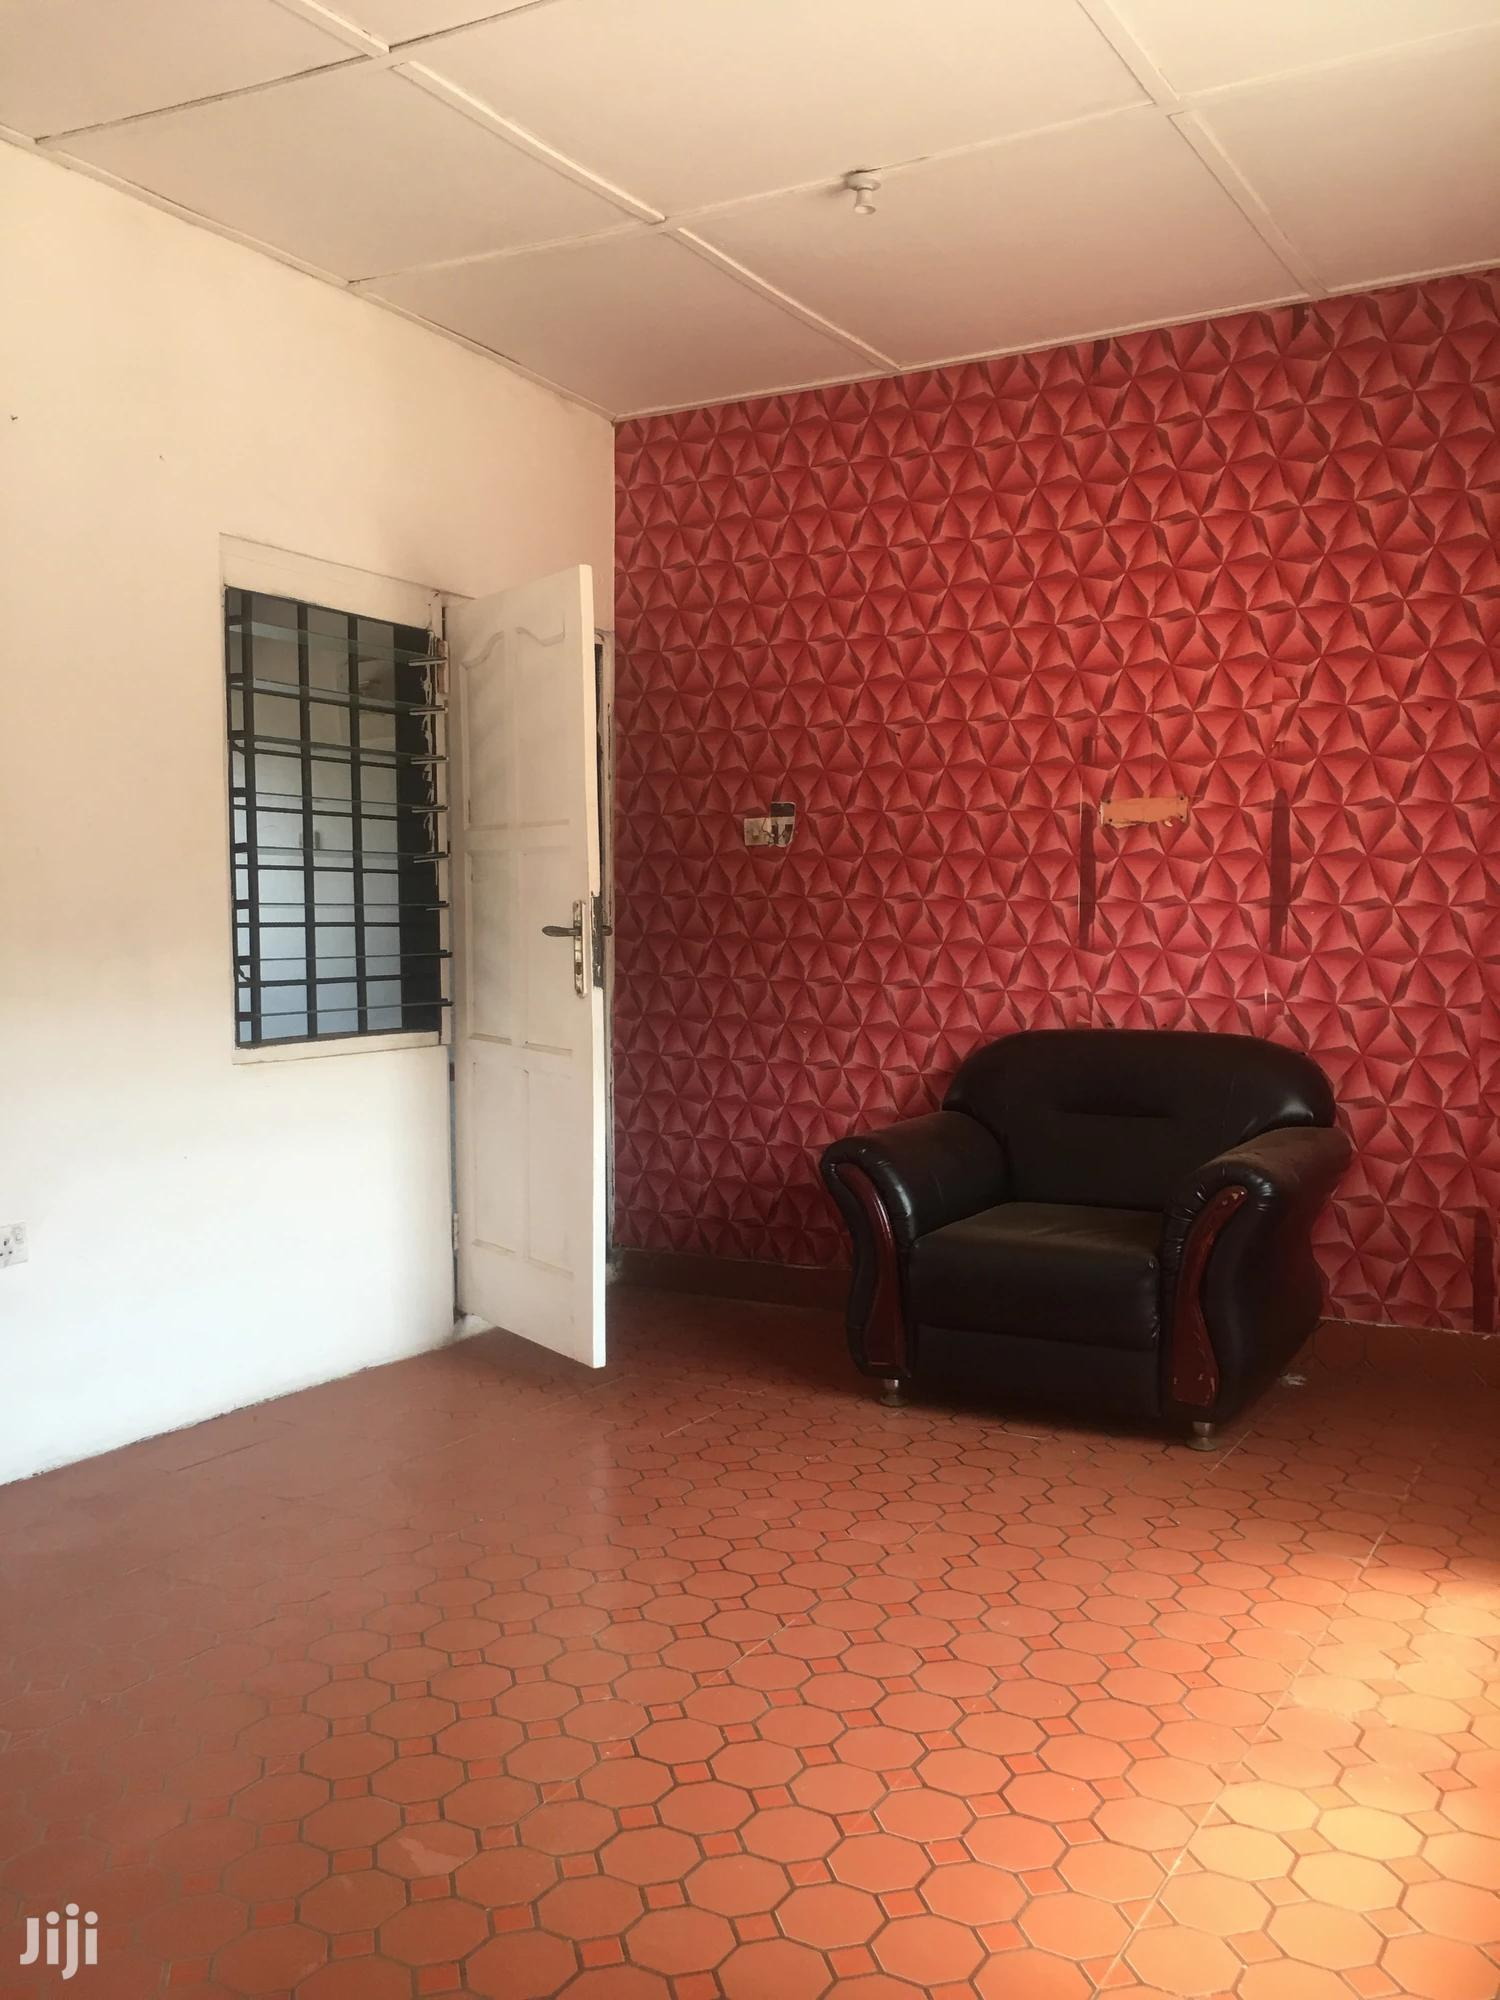 Marvlous Single Room Selfcontain 4rent Spintex 1yr